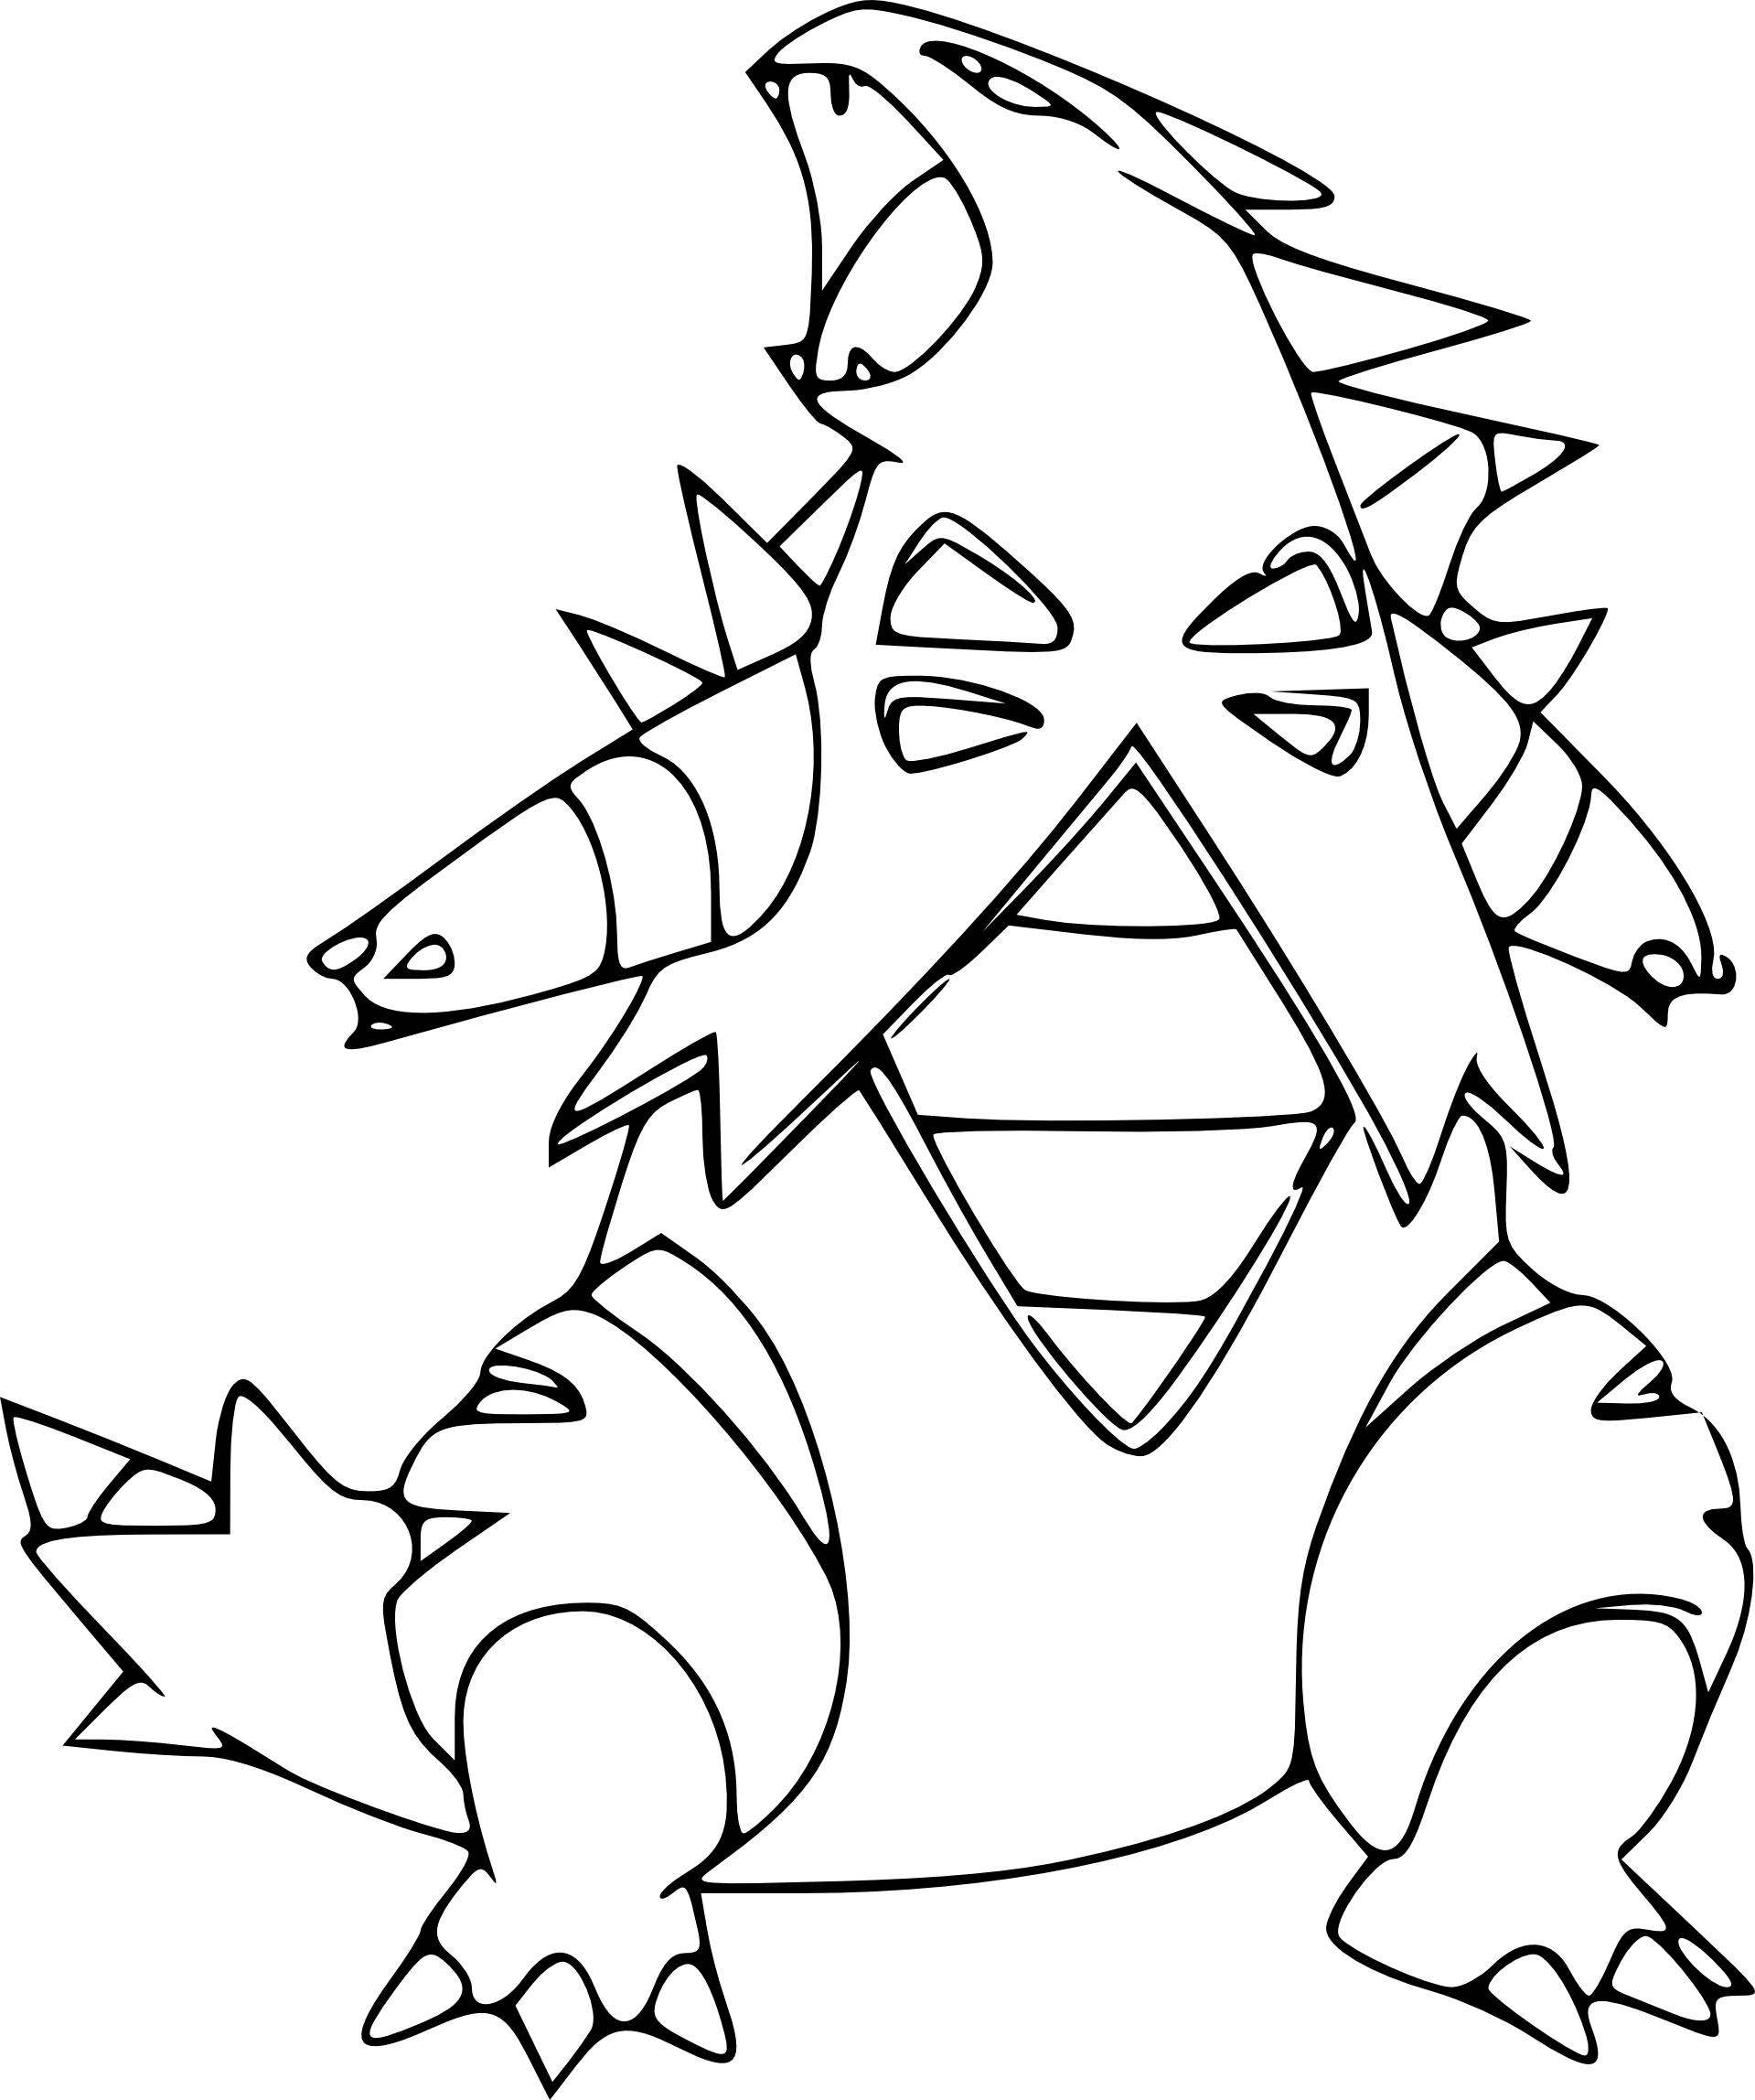 Coloriage tyranocif pokemon imprimer - Coloriage pokemon imprimer ...